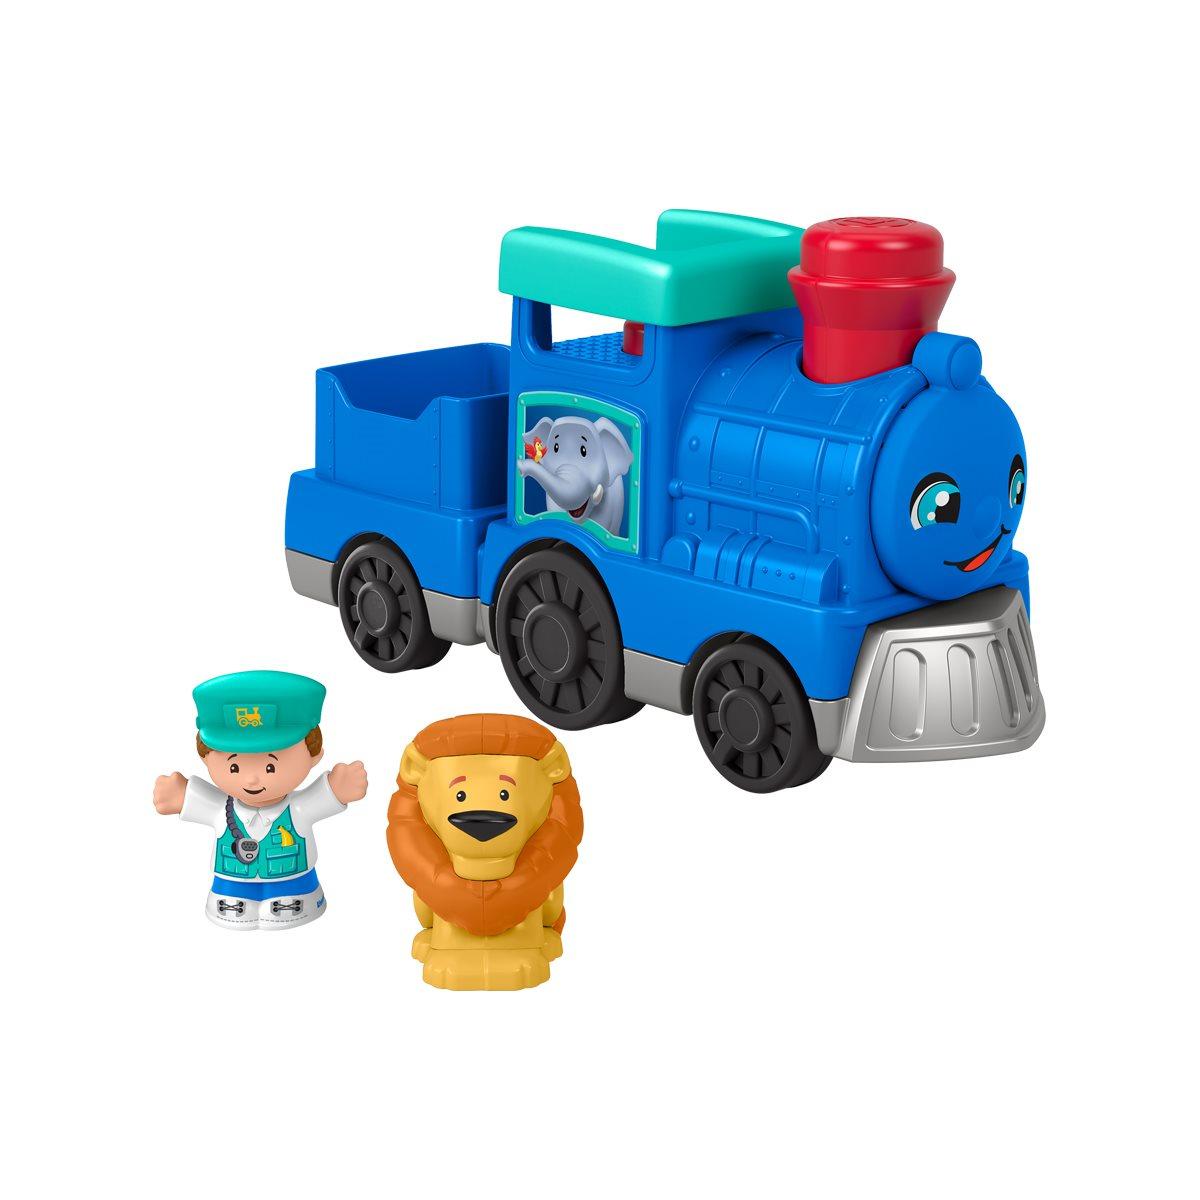 Fisher Price Little People Animal Train Vehicle